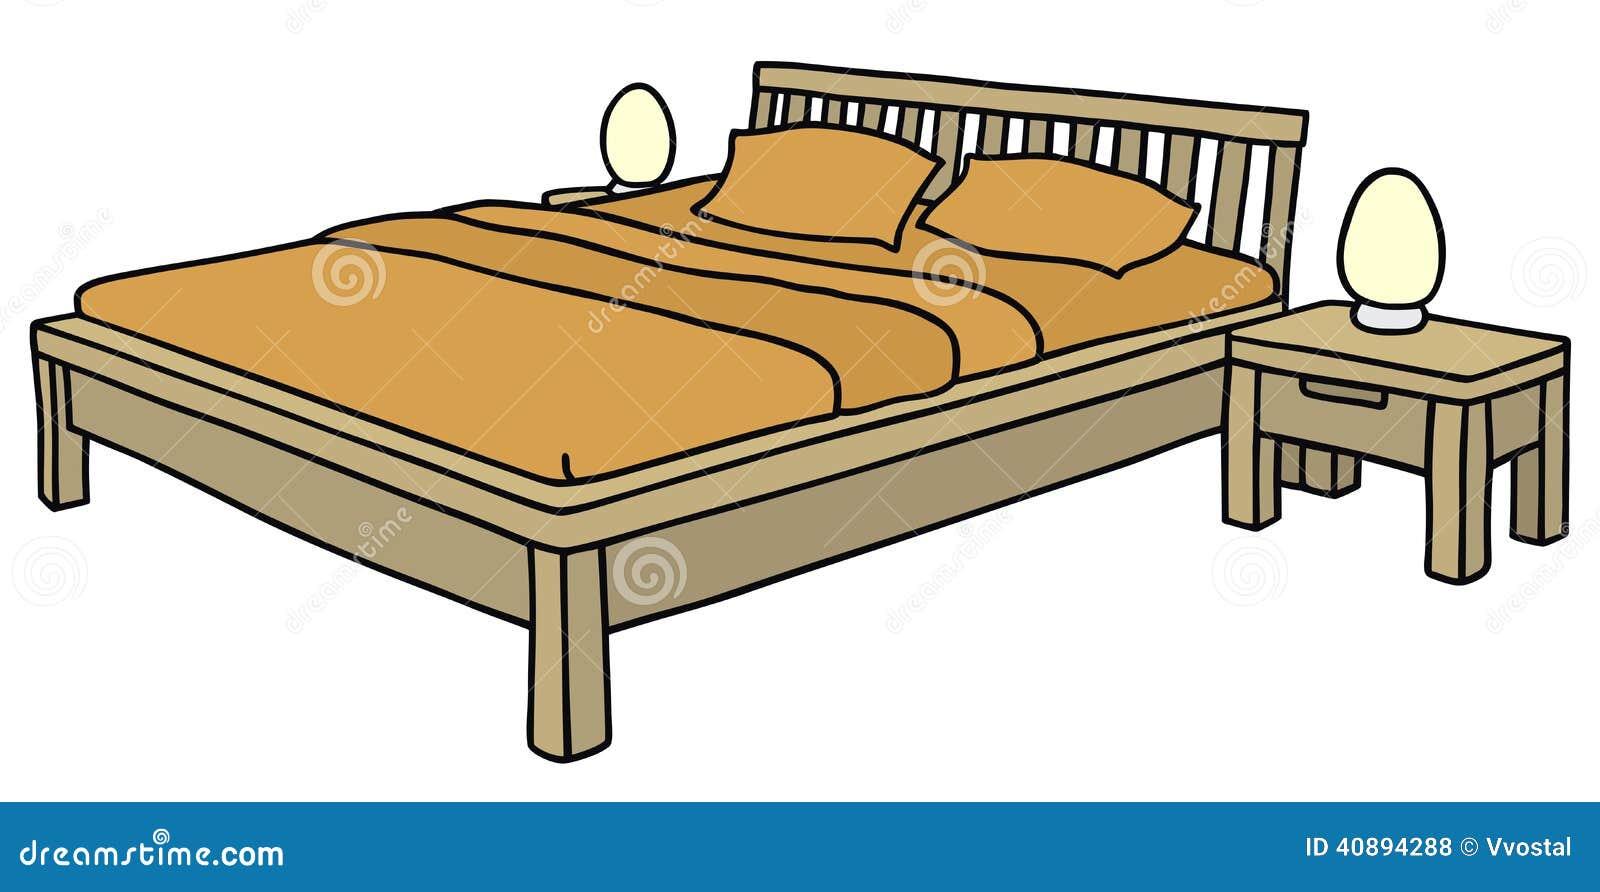 Cama ilustraci n del vector imagen 40894288 for Cama 3d dibujo